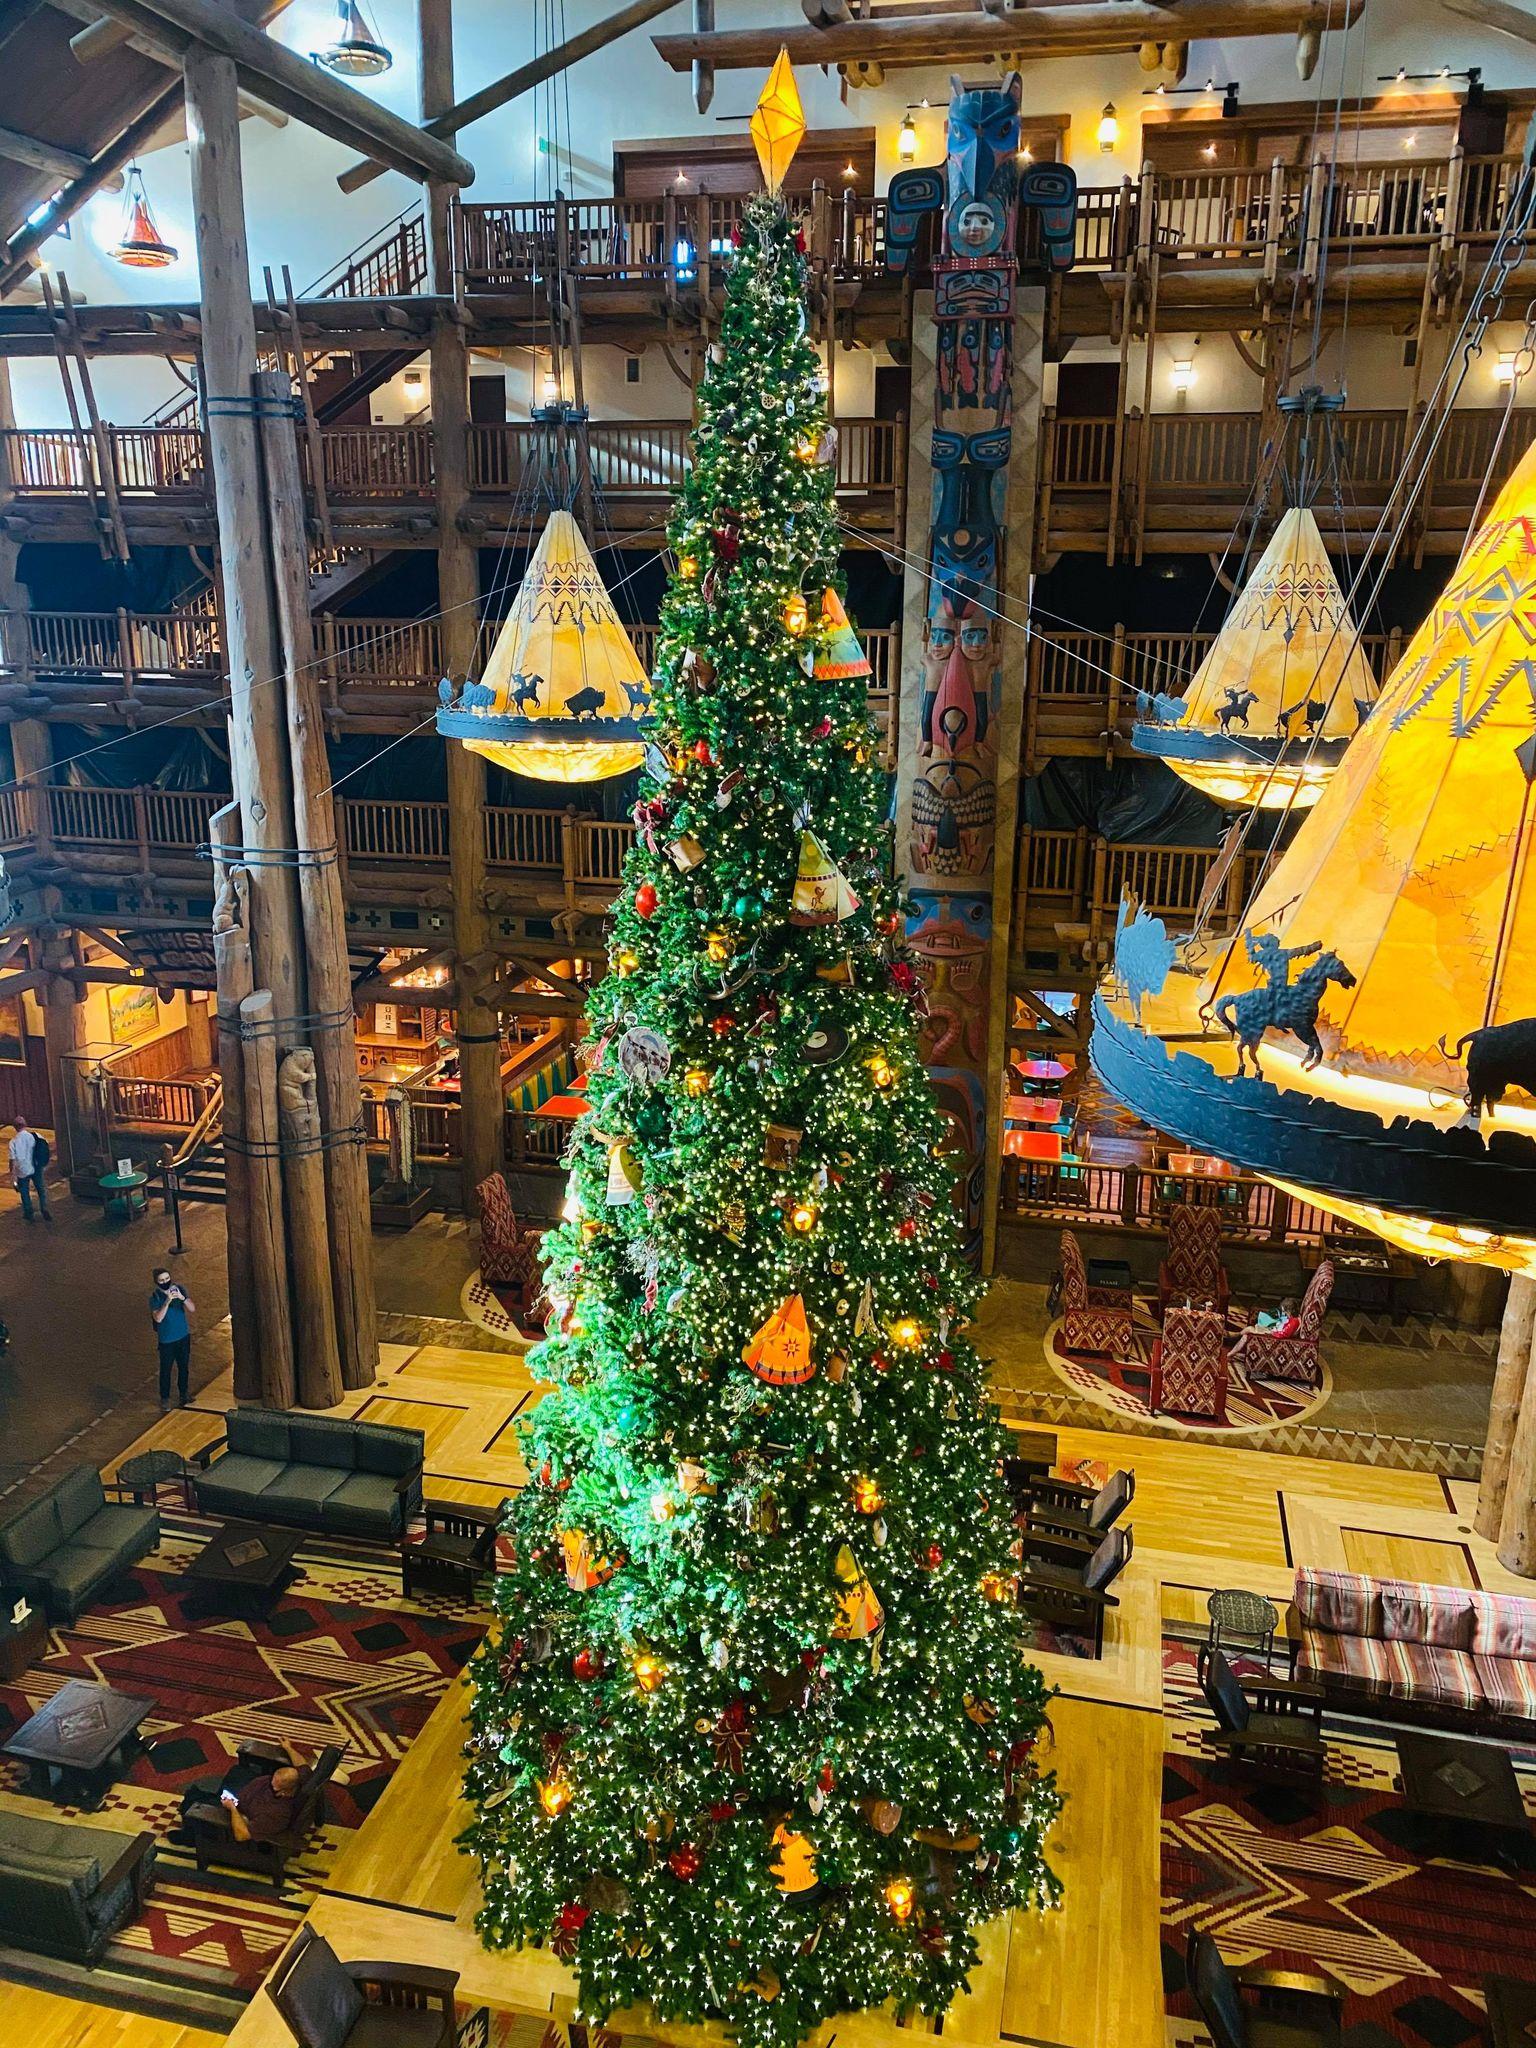 Wilderness lodge Christmas